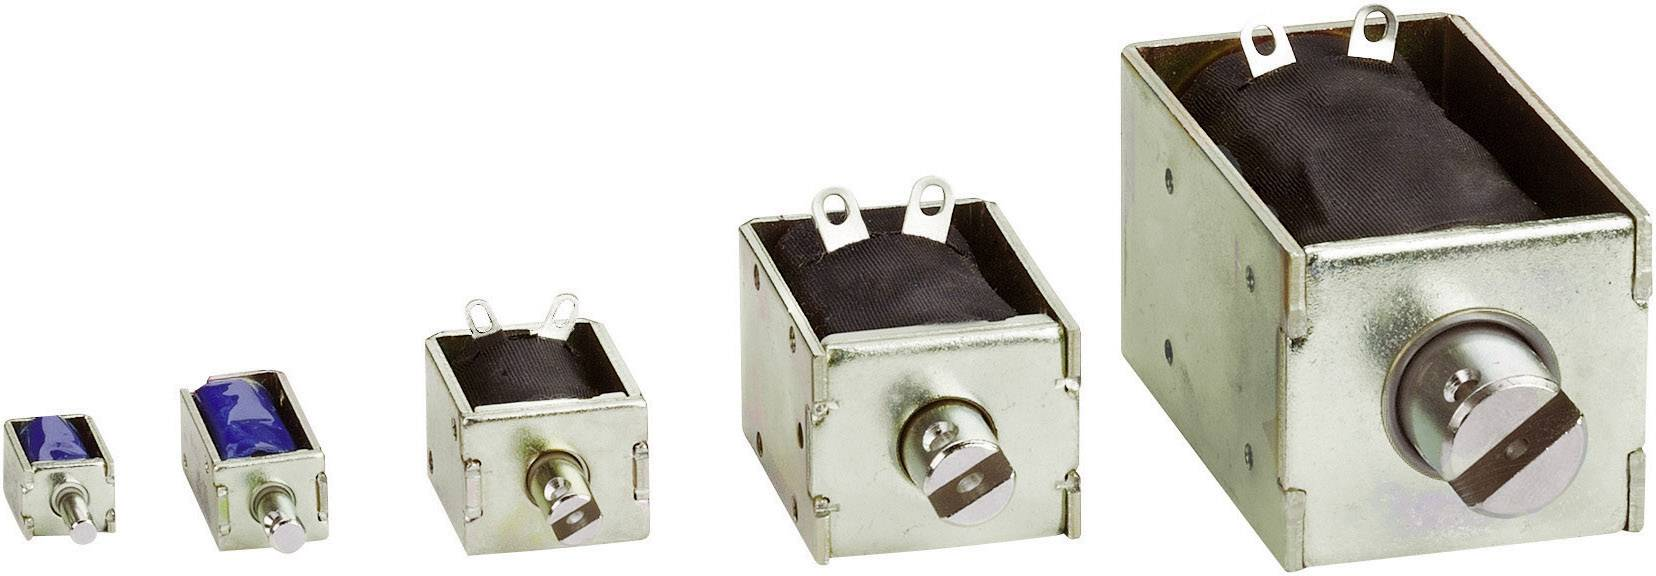 Zdvihací magnet zdvíhacie EBE Group TDS-06A 3103391, 0.3 N, 8 N, 24 V/DC, 2.1 W